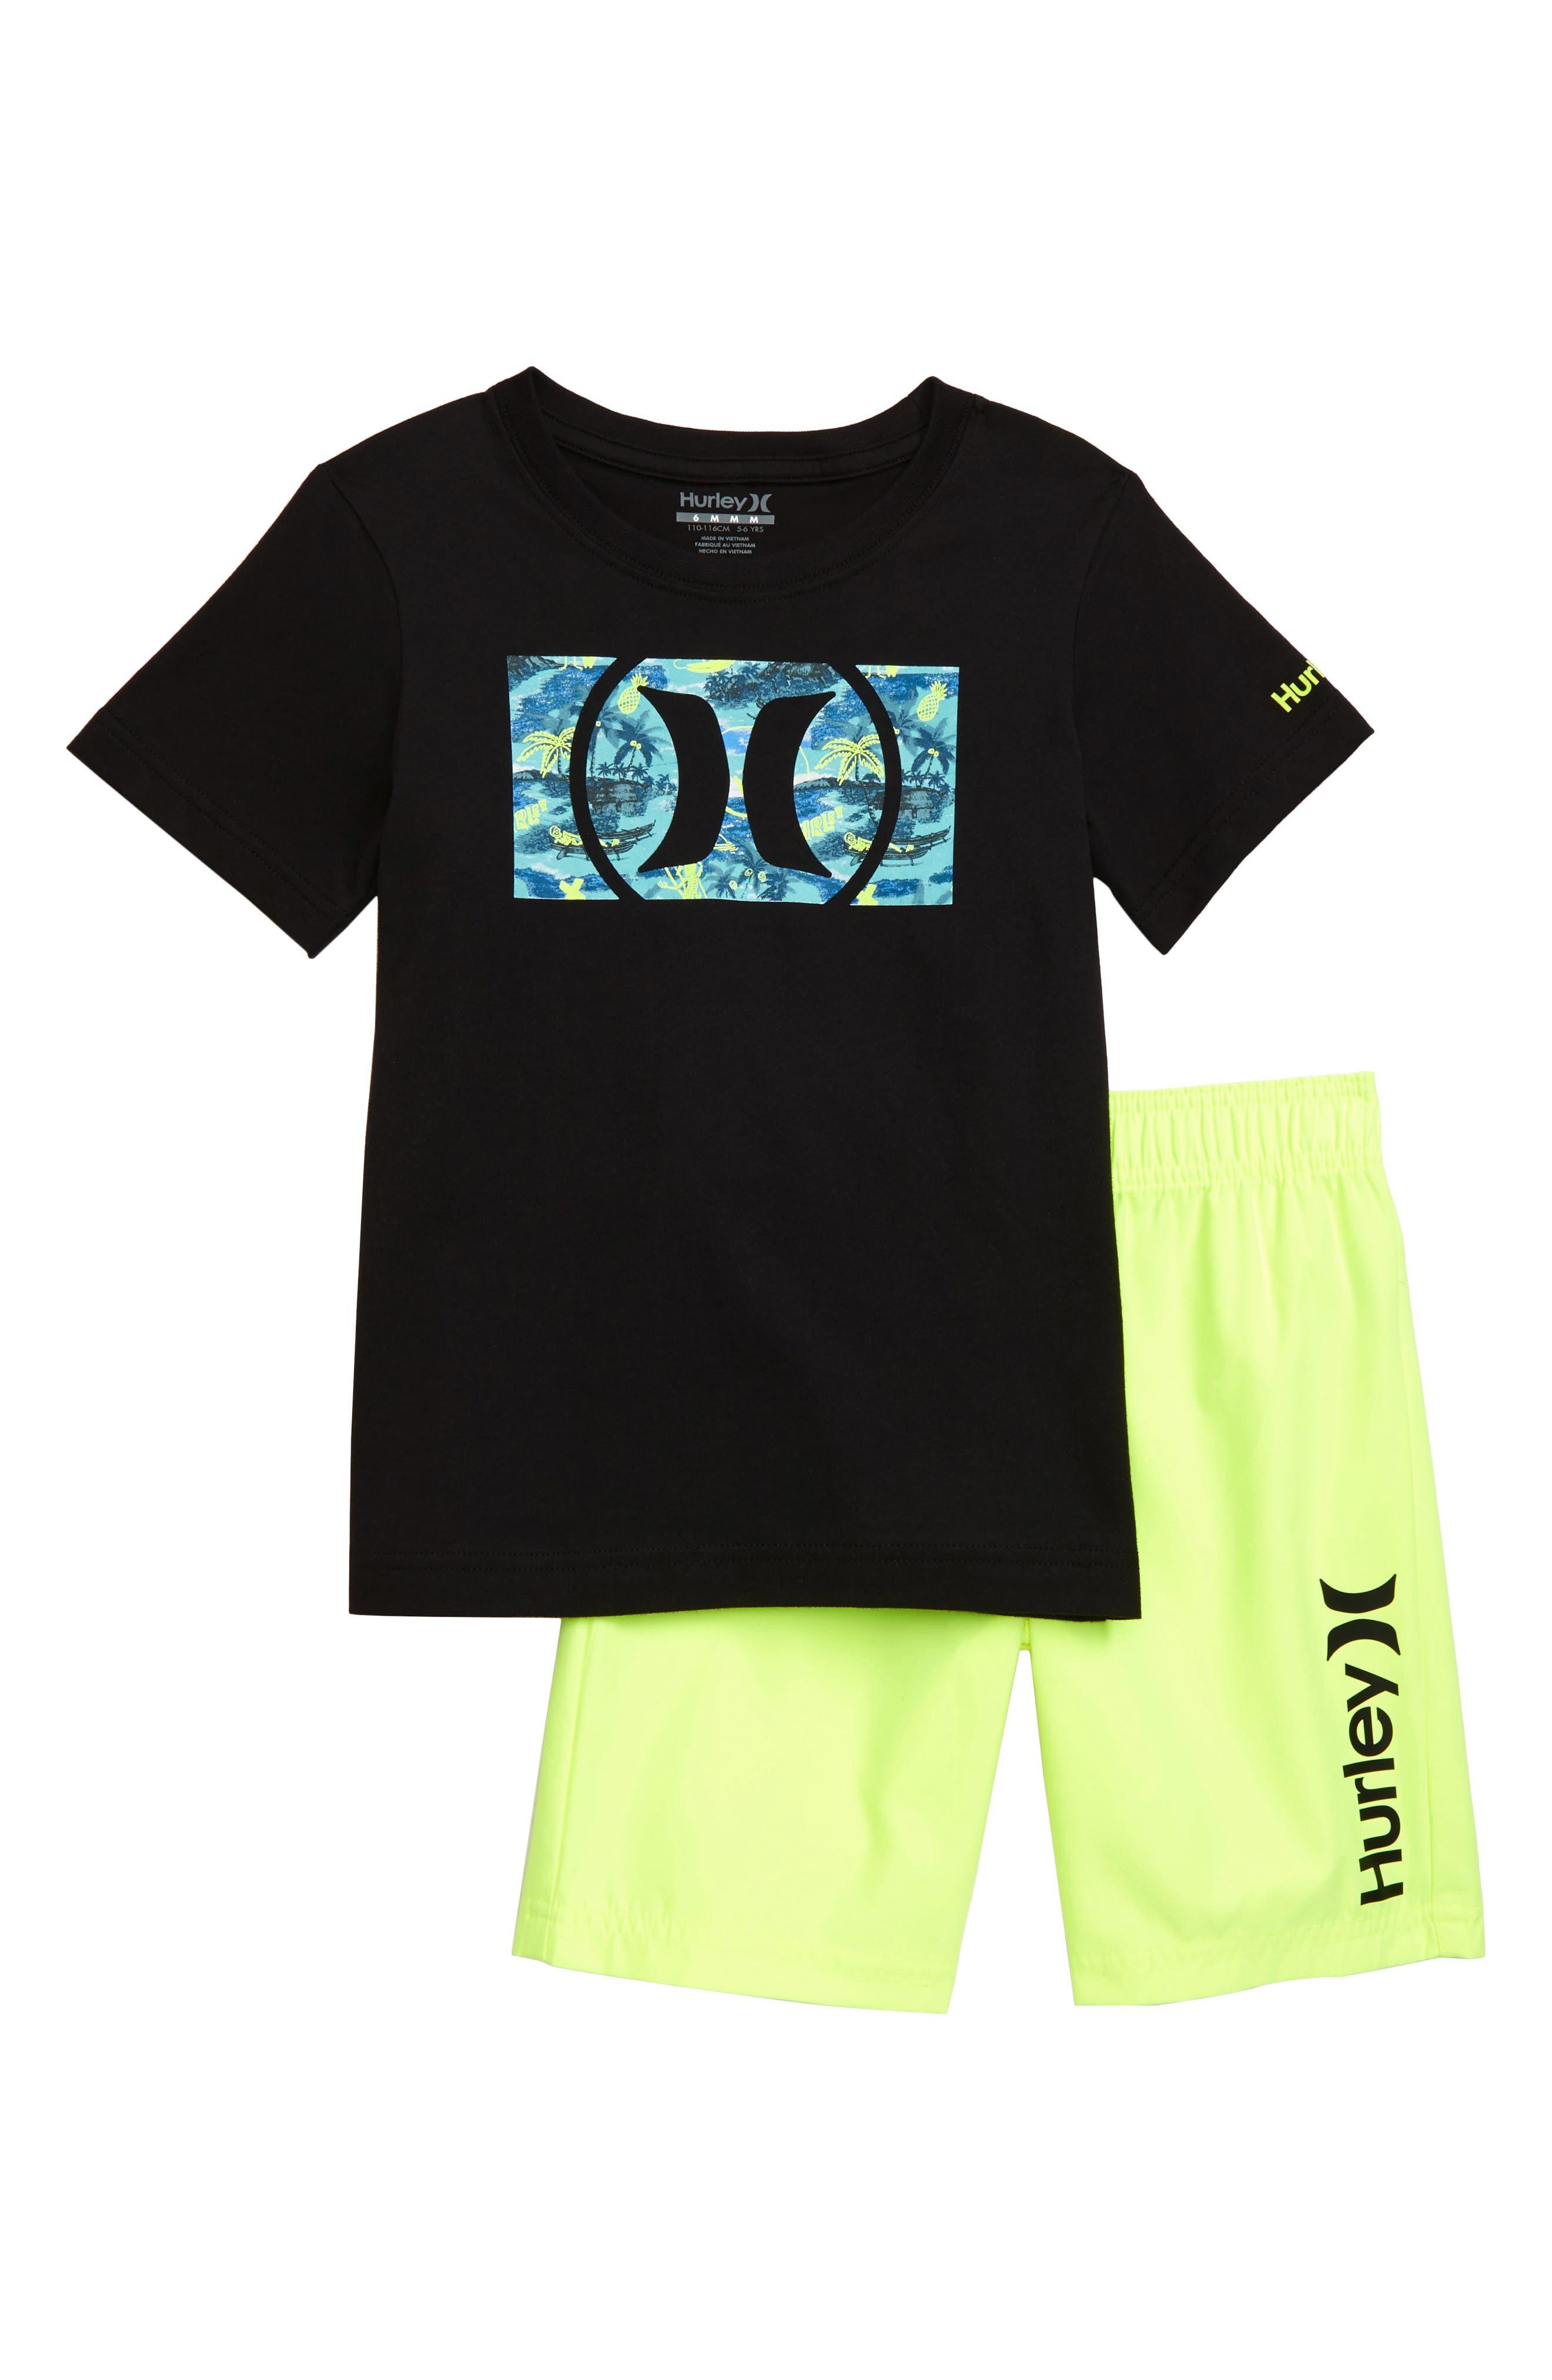 Toddler Boys Hurley Logo TShirt  Athletic Shorts Set